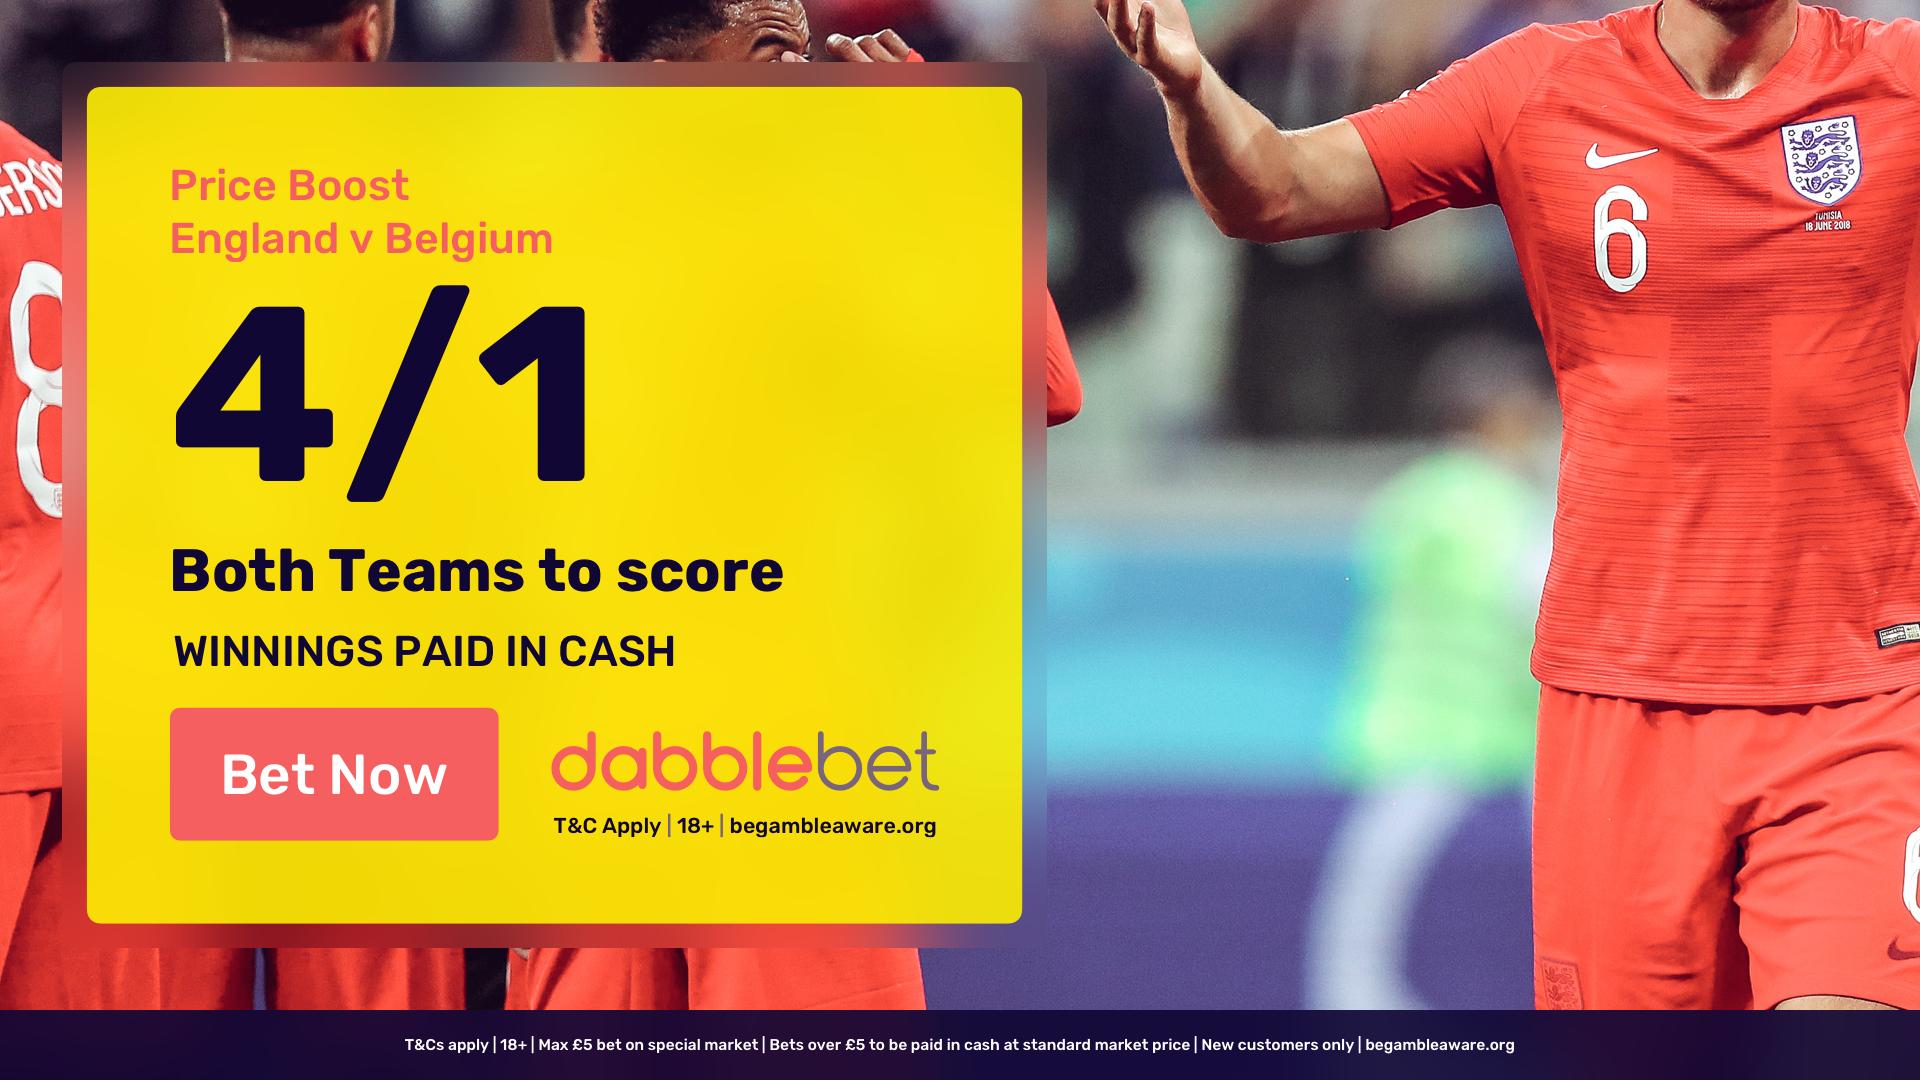 England poland betting odds best online sports betting bonuses